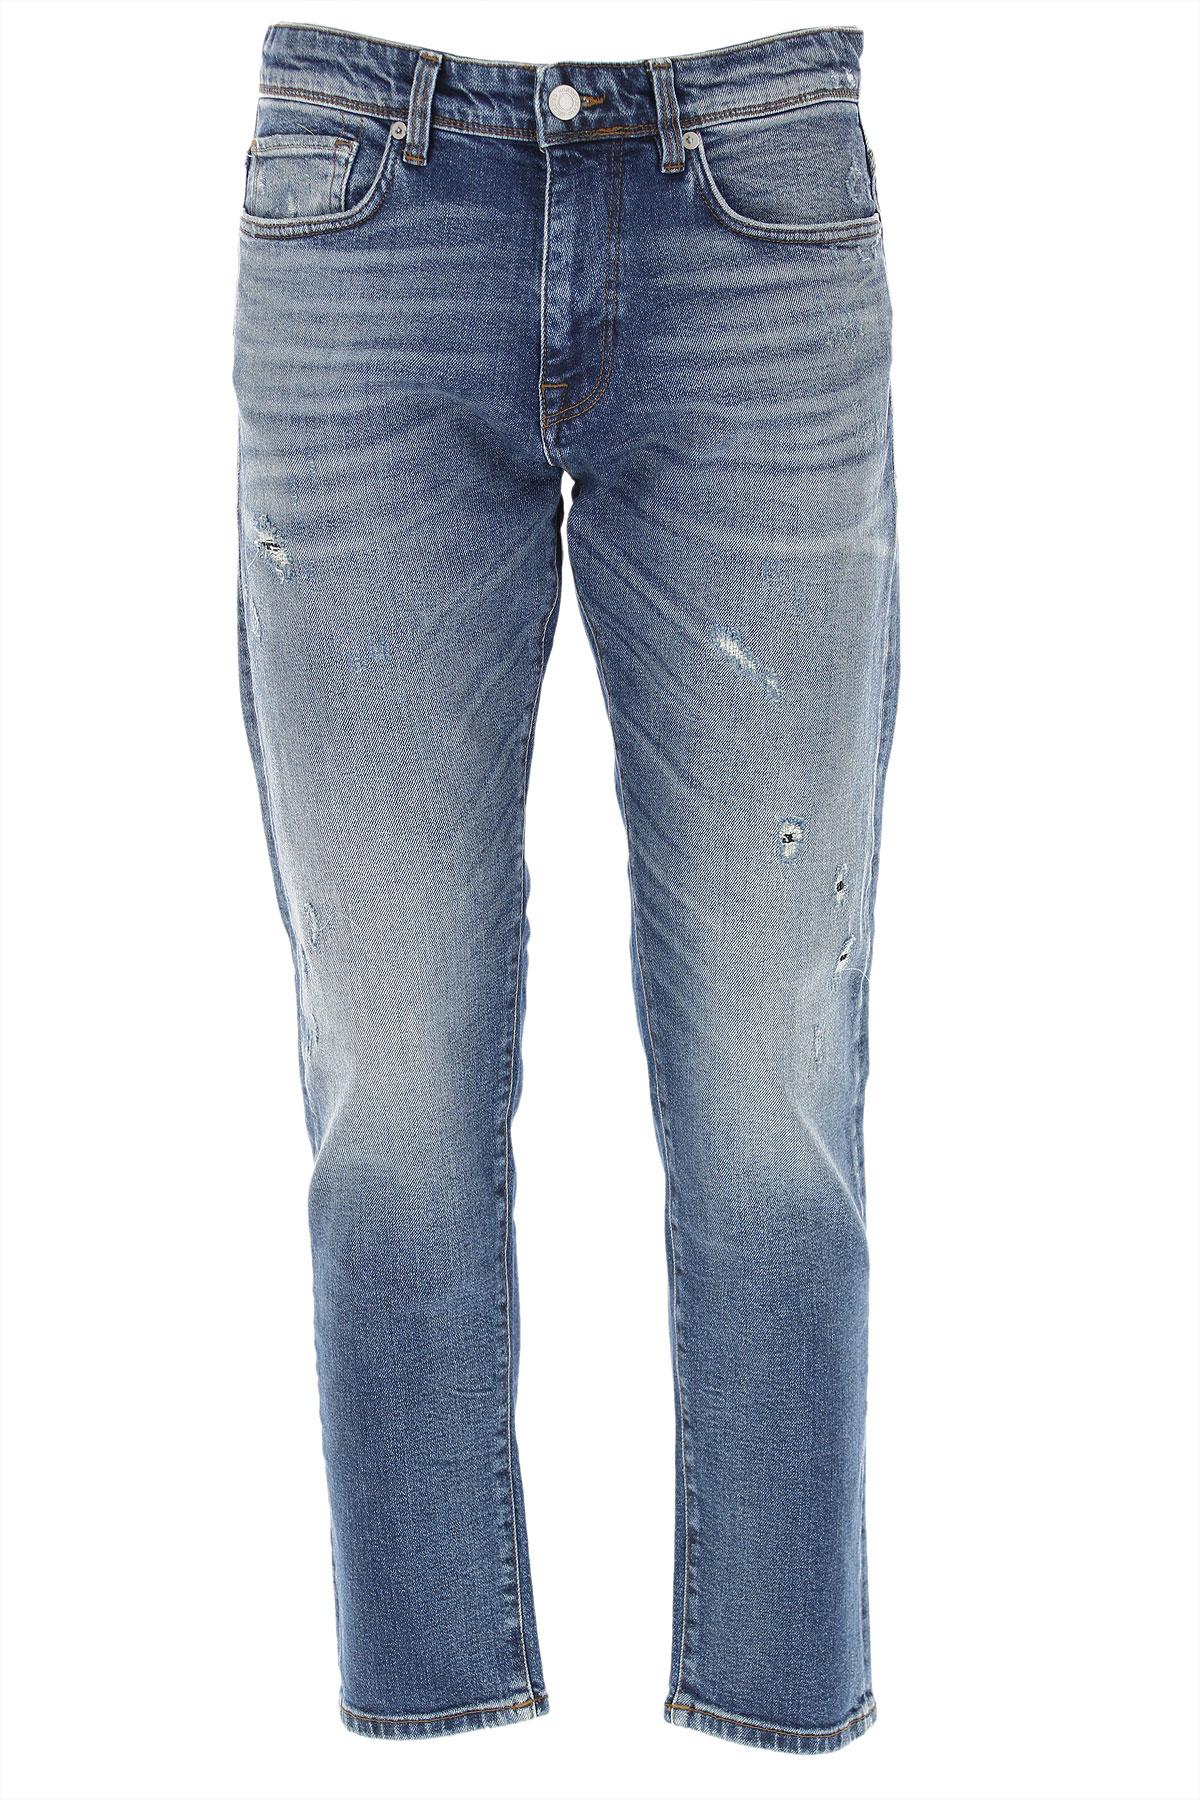 Selected Jeans On Sale, Denim, Cotton, 2019, 29 30 31 32 34